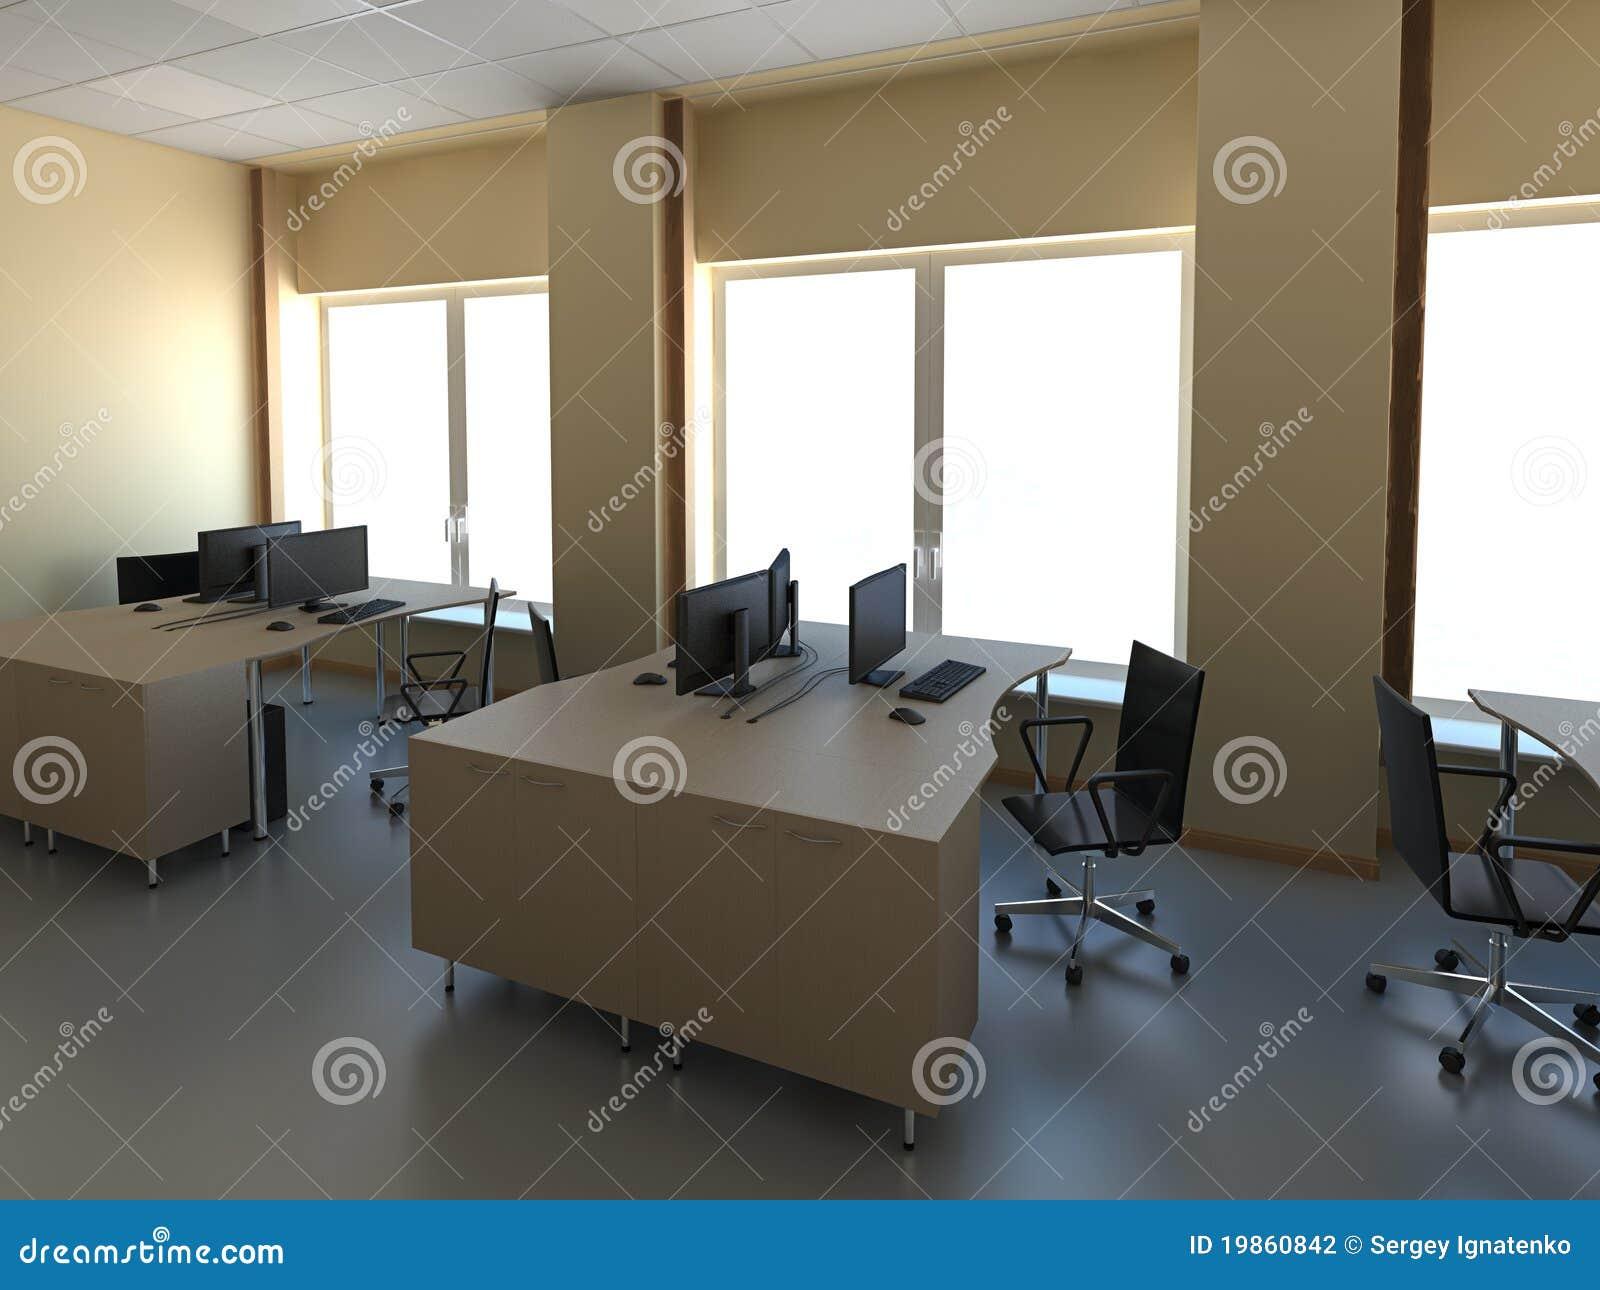 Modernes Buro Mit Den Computern Innen Stock Abbildung Illustration